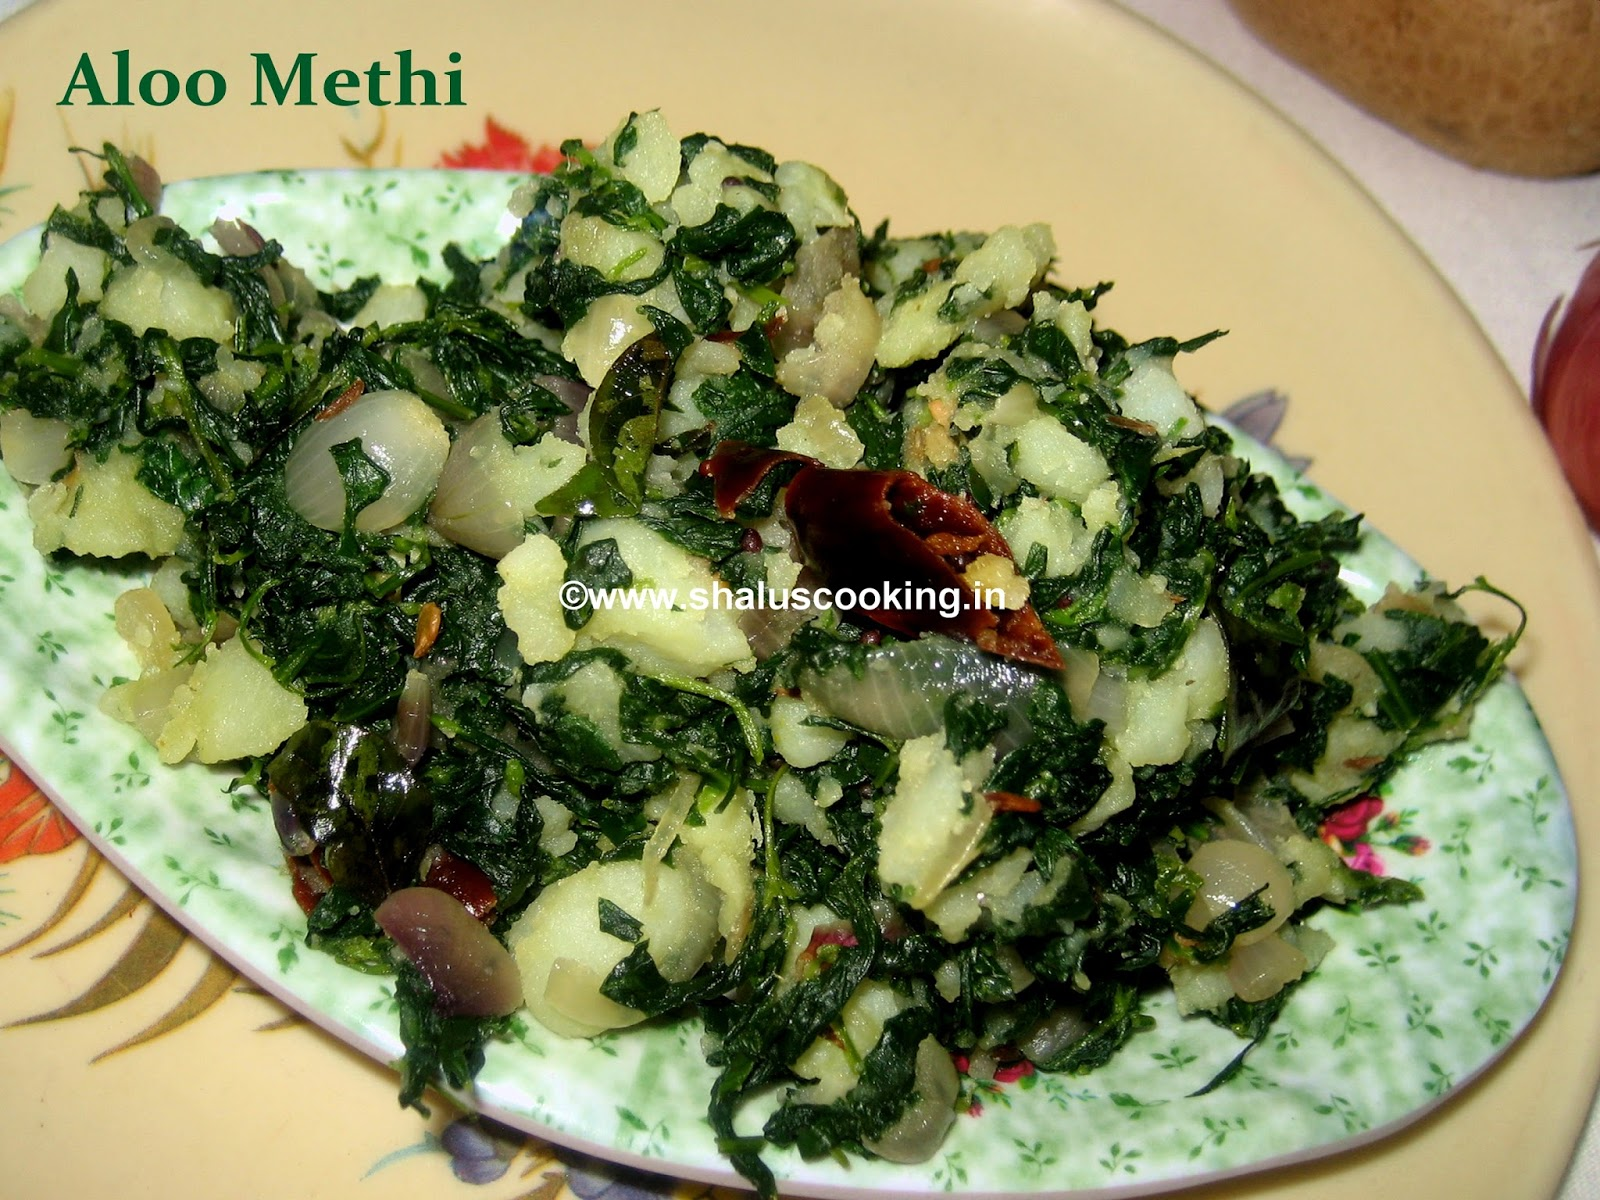 Shalu's Cooking: Aloo Methi - Fenugreek Leaves with Potato